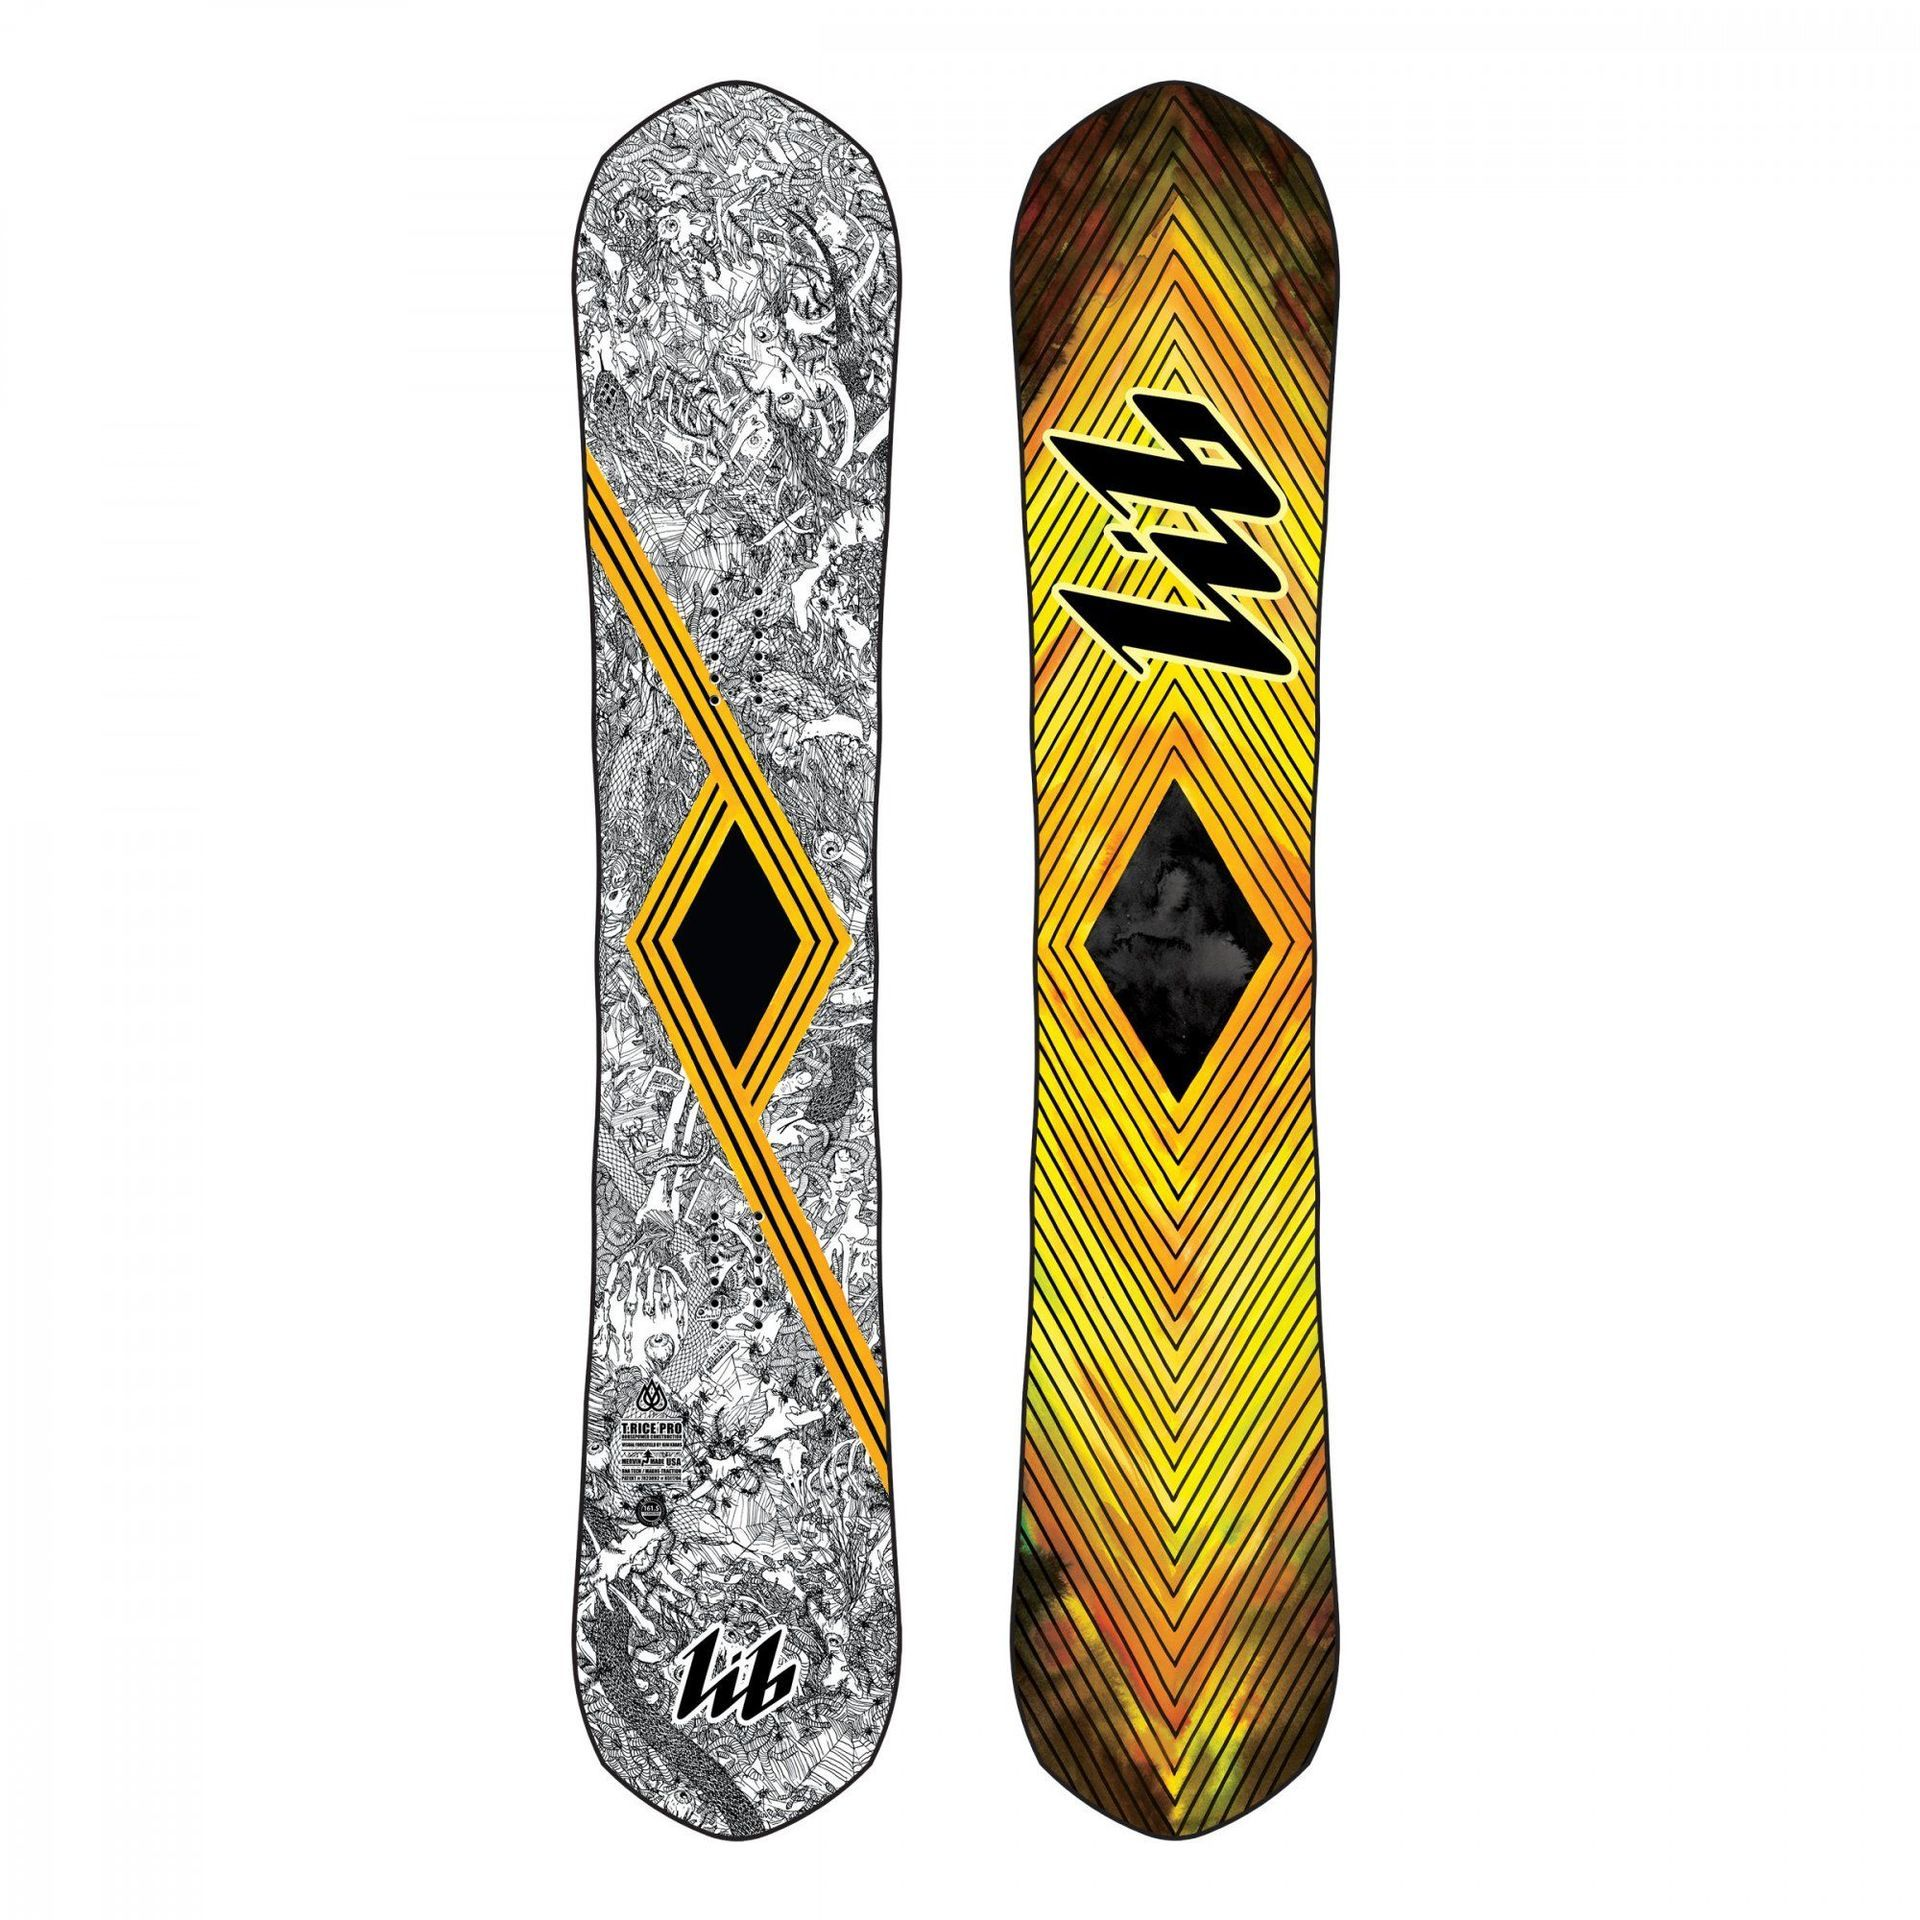 DESKA SNOWBOARDOWA LIB TECH T-RICE PRO HP POINTY 19SN070